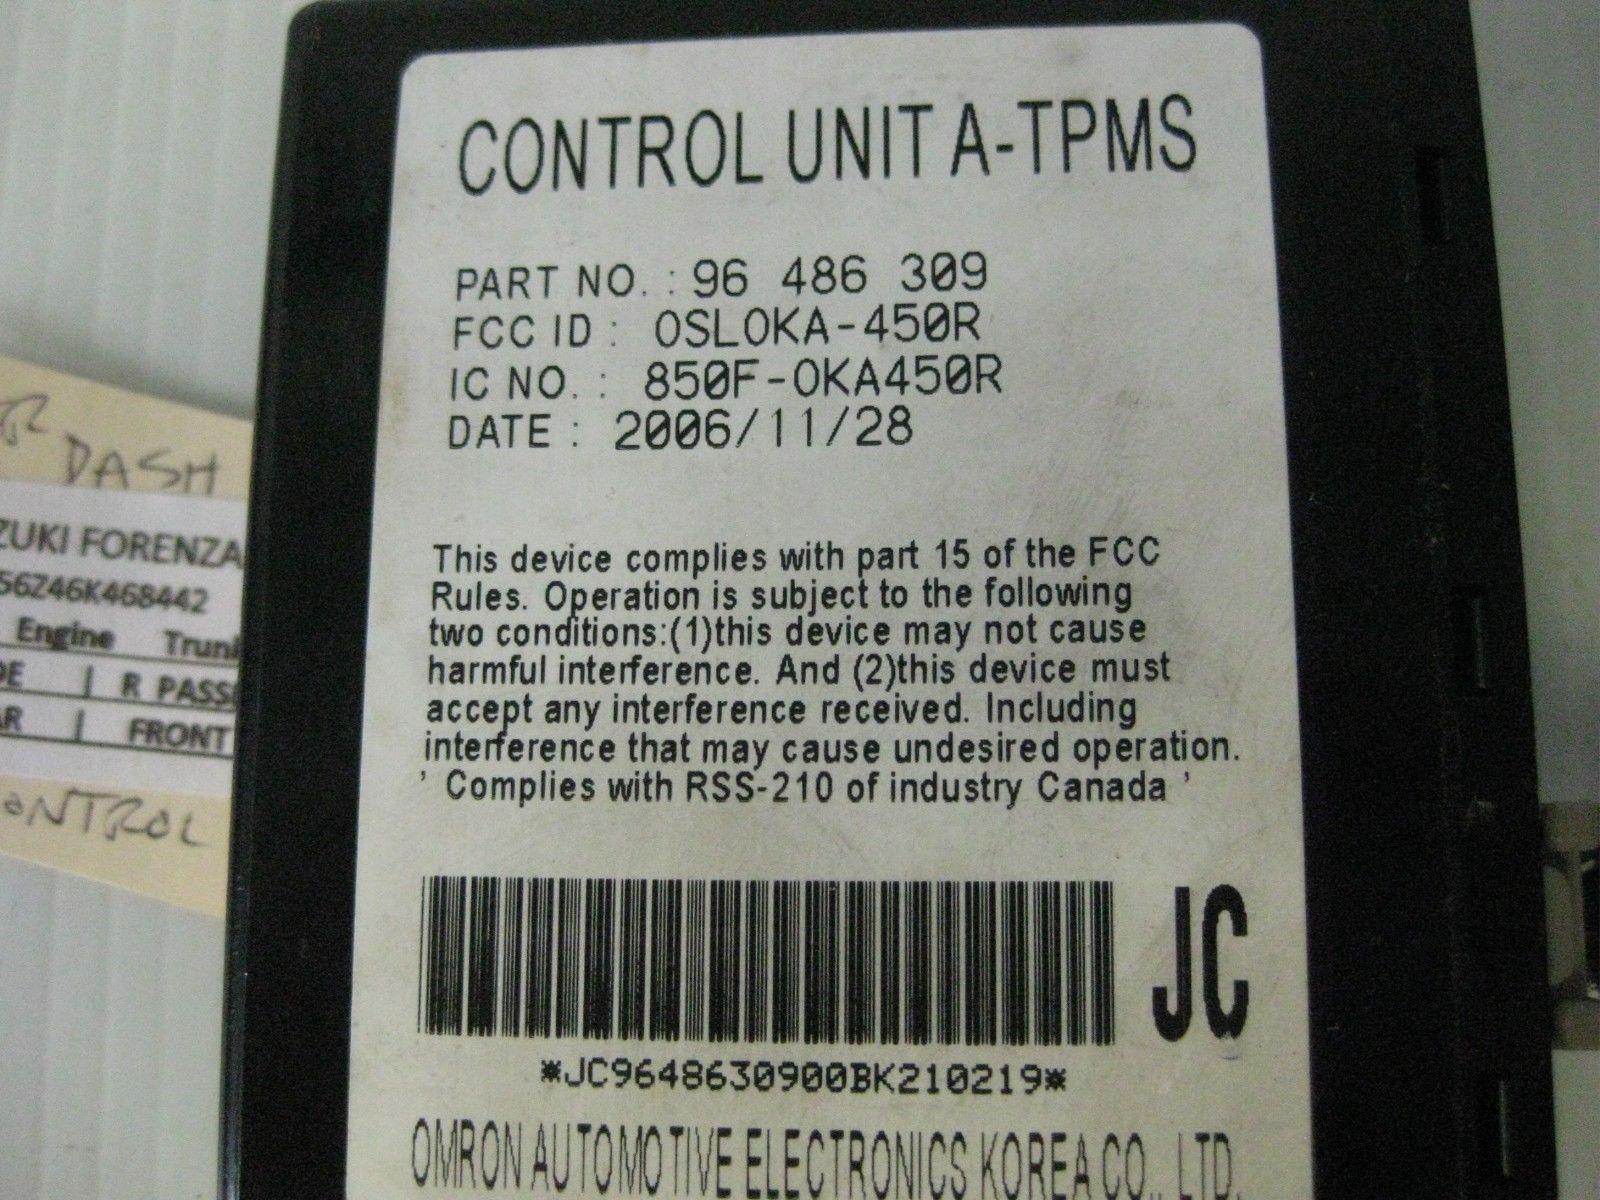 Suzuki Forenza 2006 TPMS Control Unit OEM 96486309